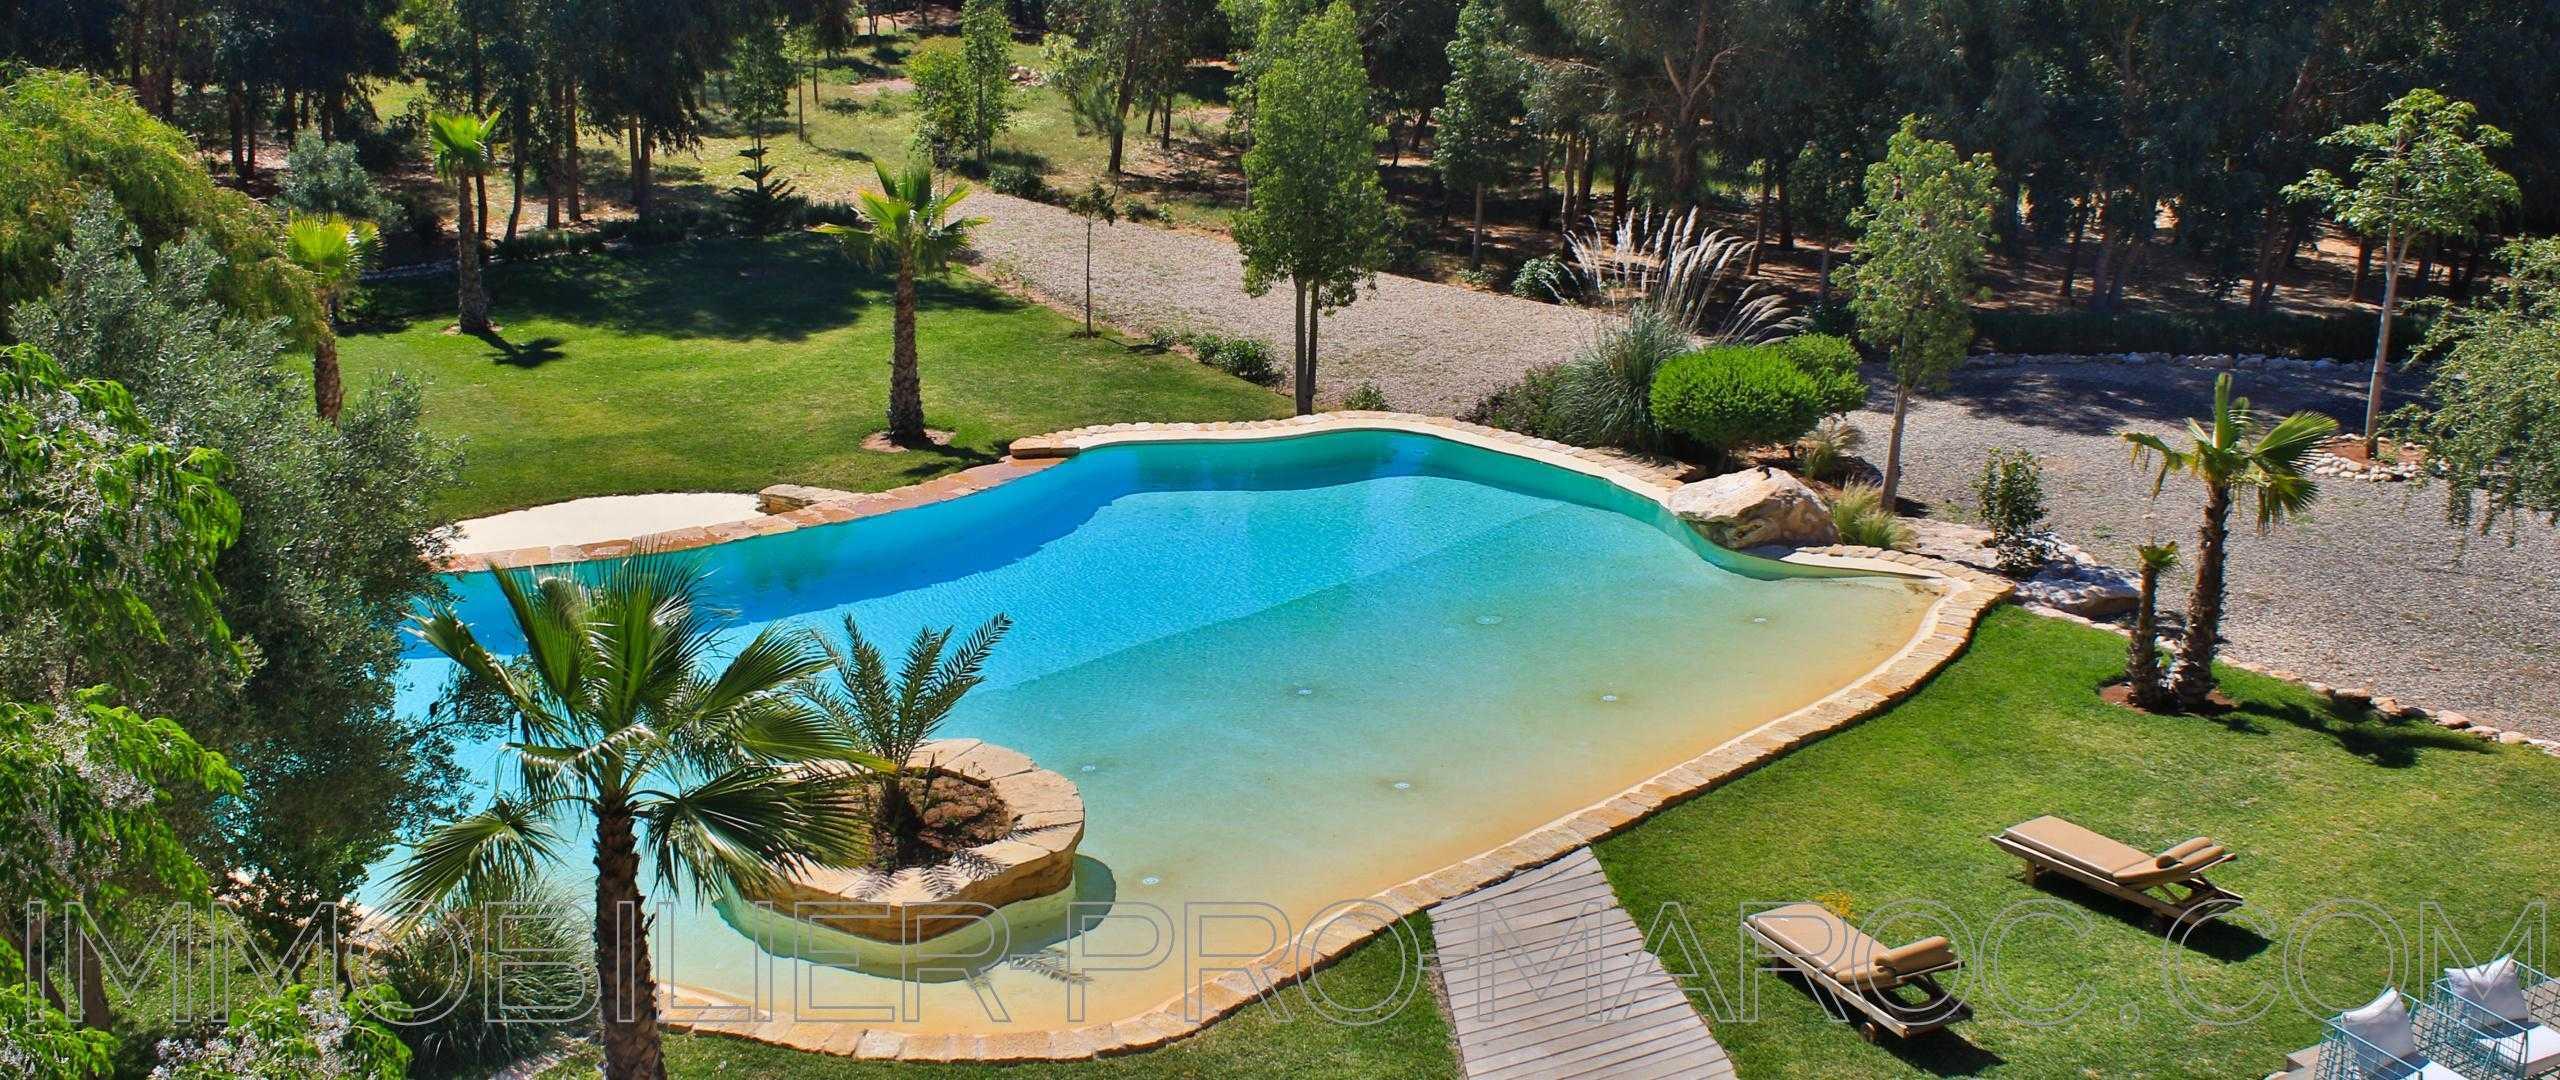 Demeure de charme à seulement qlqs kms d'Essaouira